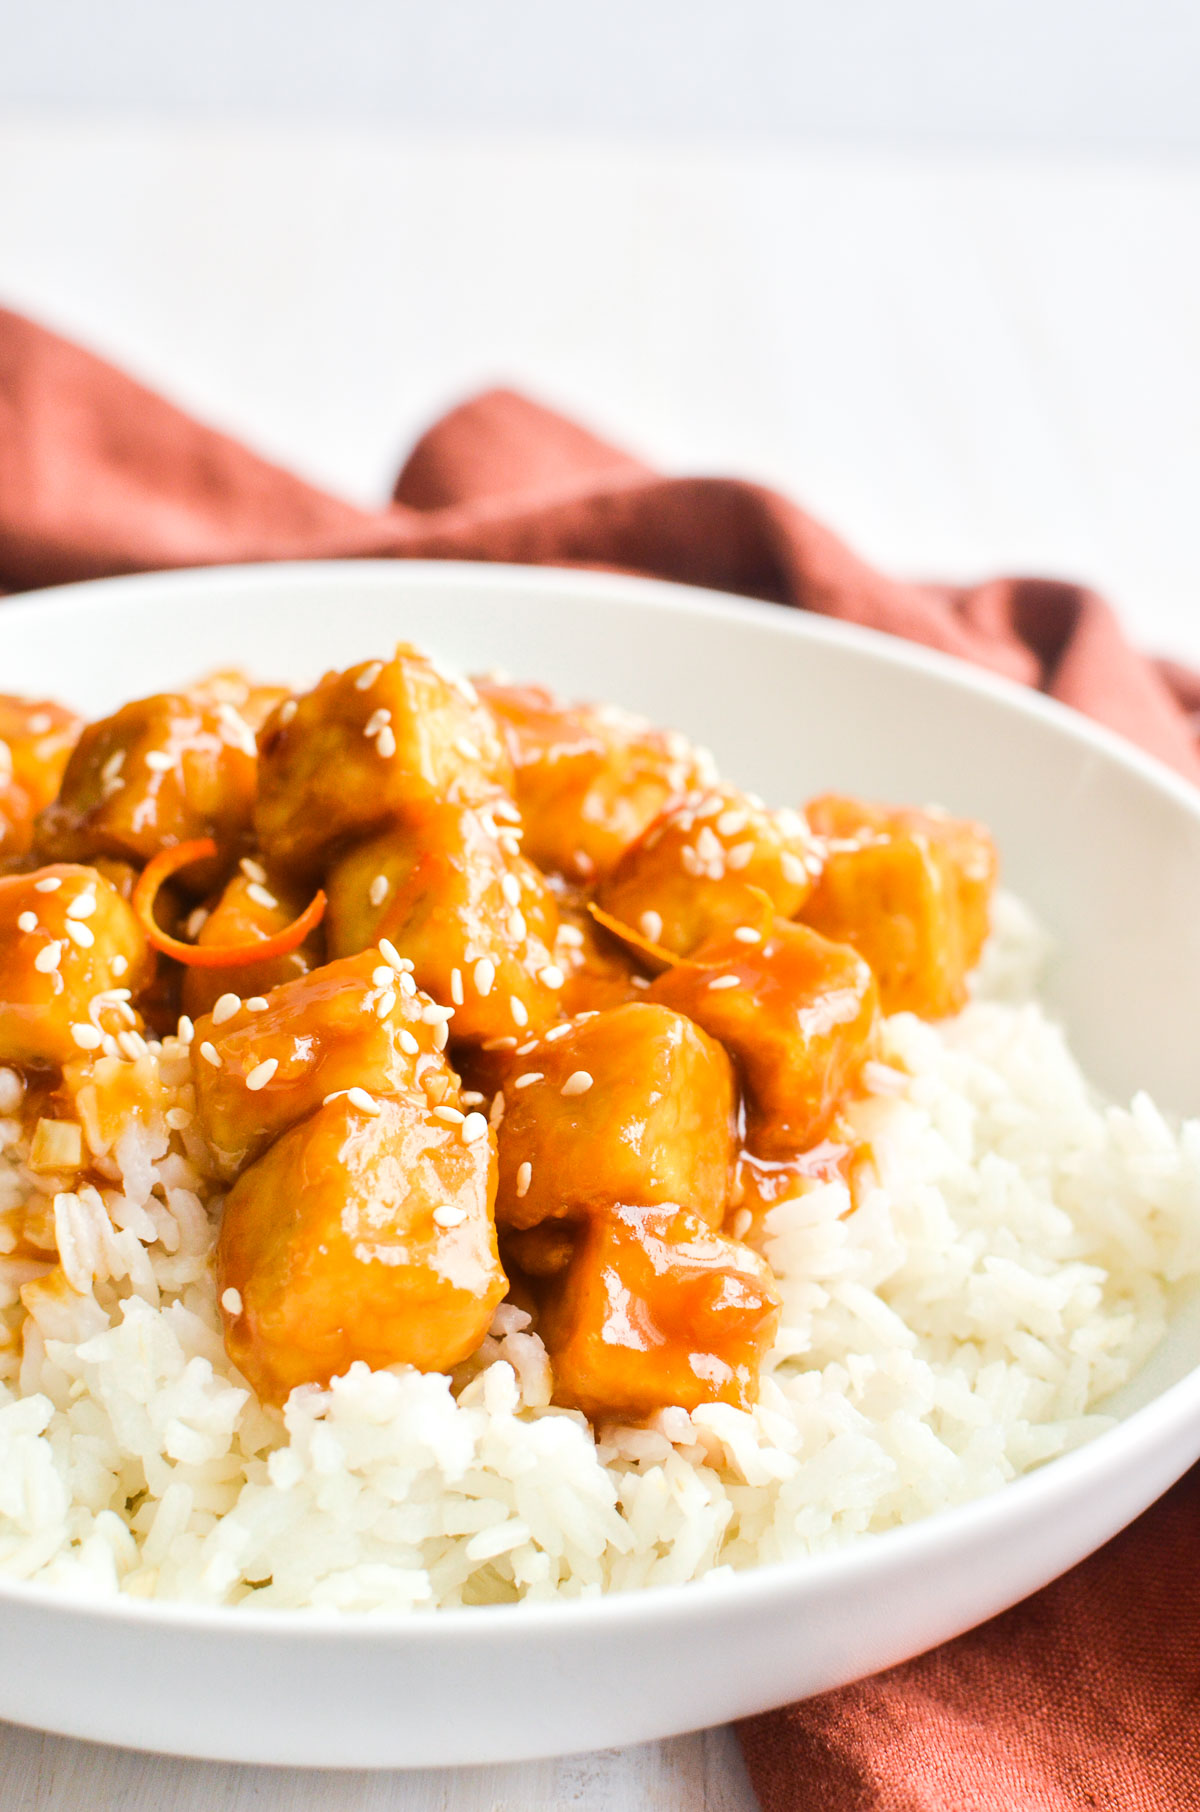 Orange tofu with rice and sesame seeds